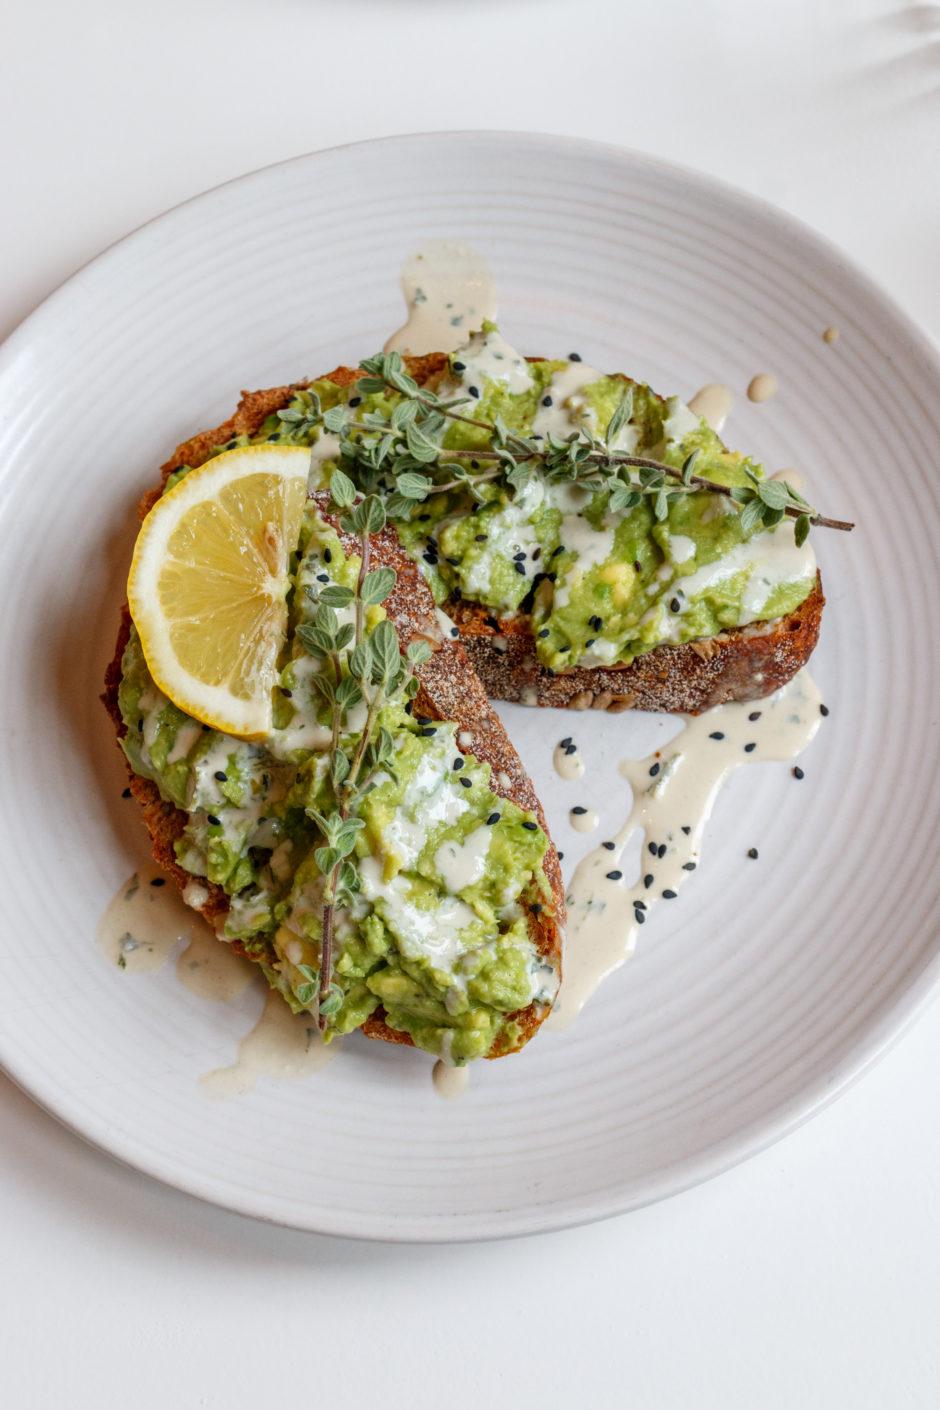 Cotton Cake avocado toast